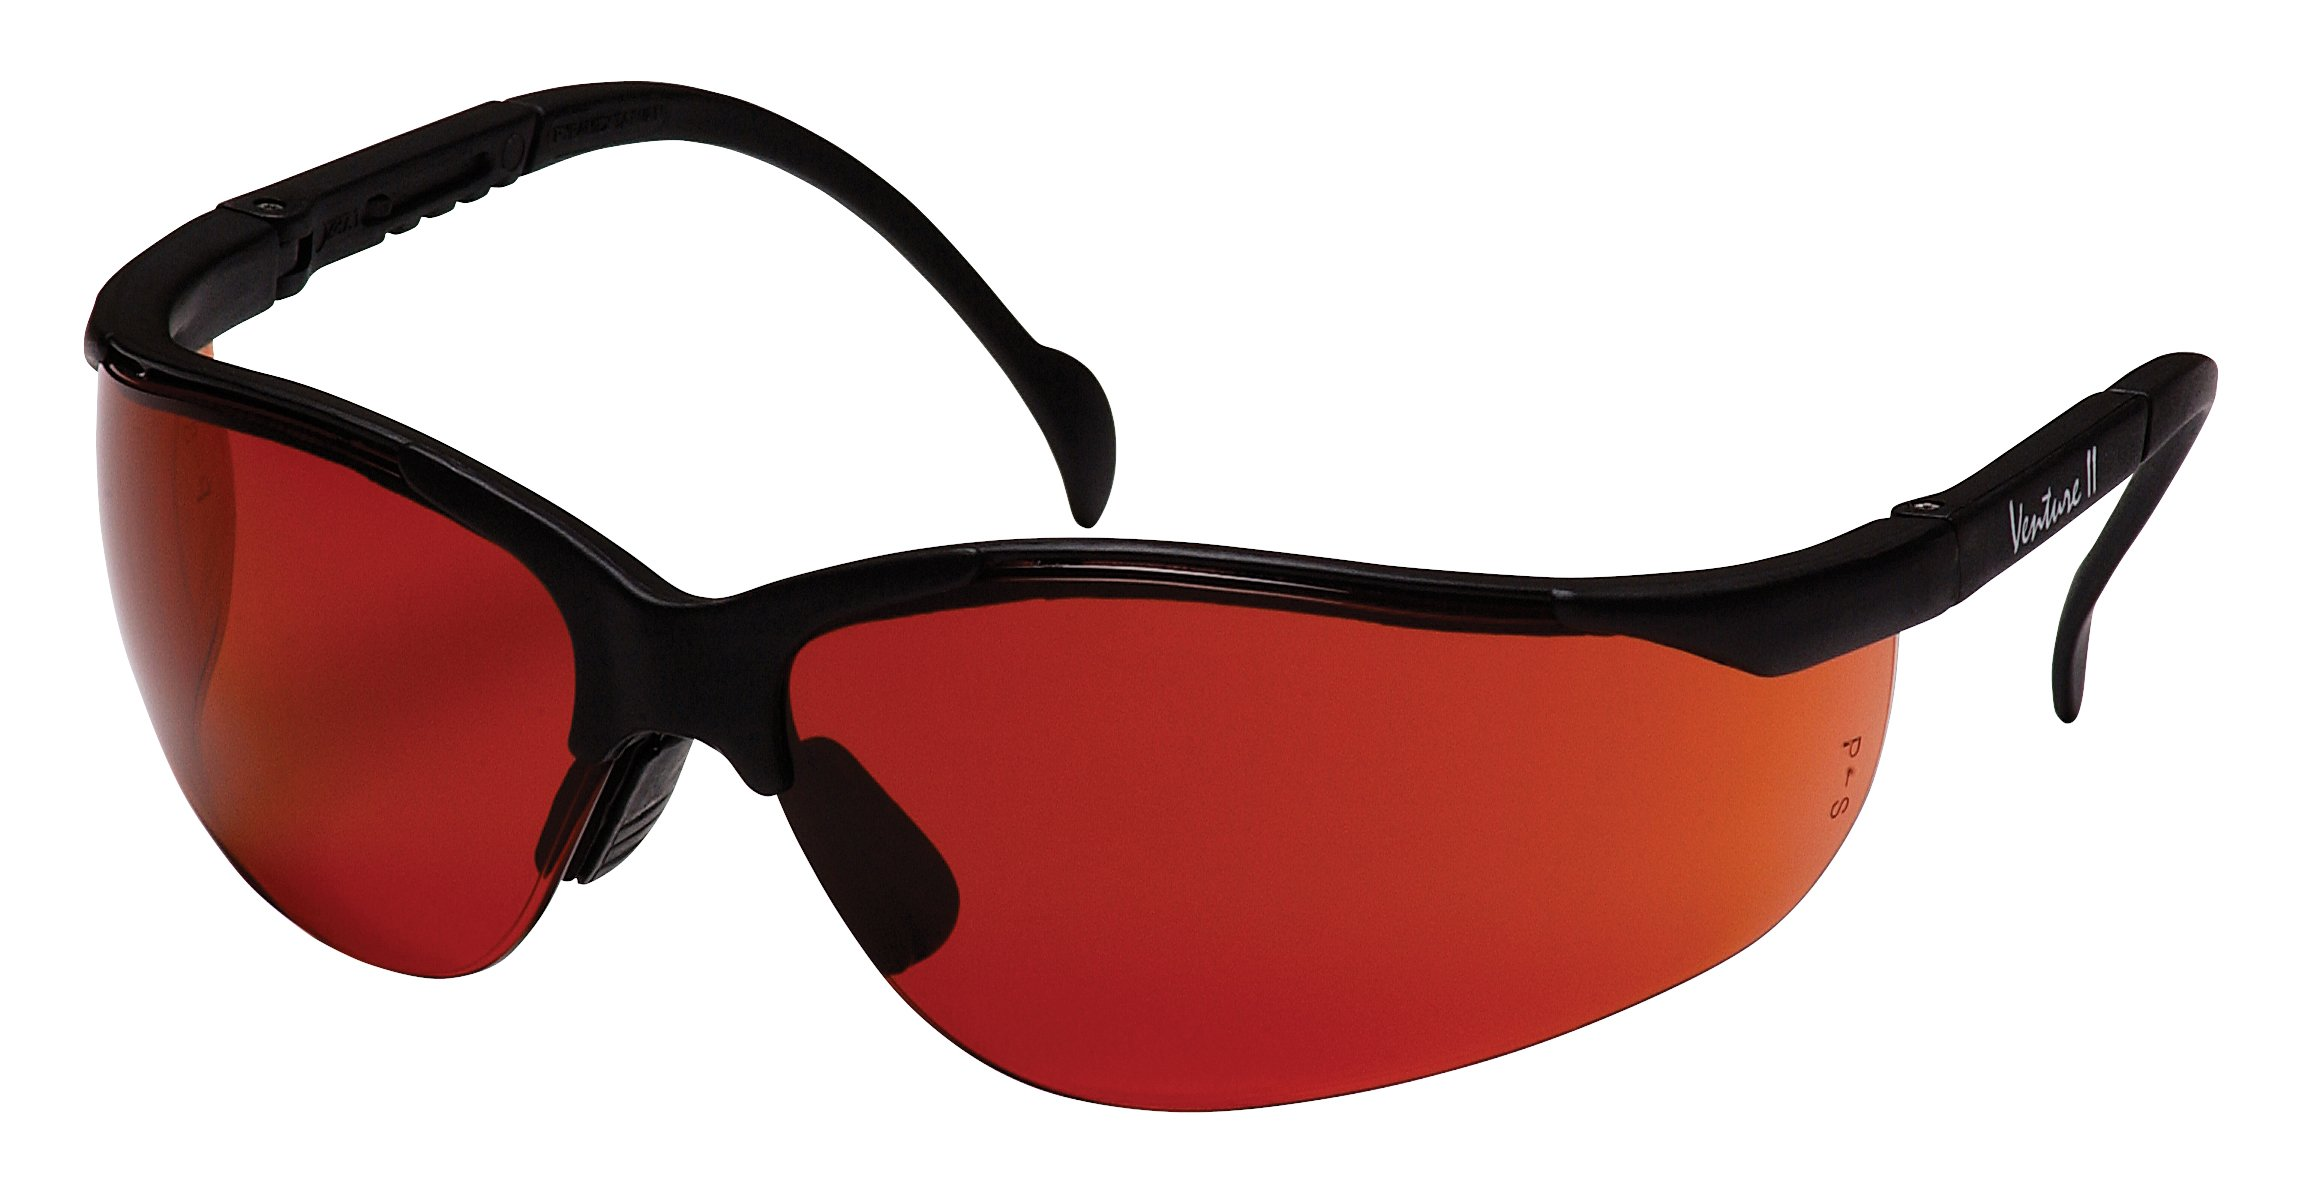 Pyramex Venture Ii Safety Eyewear, Sun Block Bronze Lens With Black Frame by Pyramex Safety